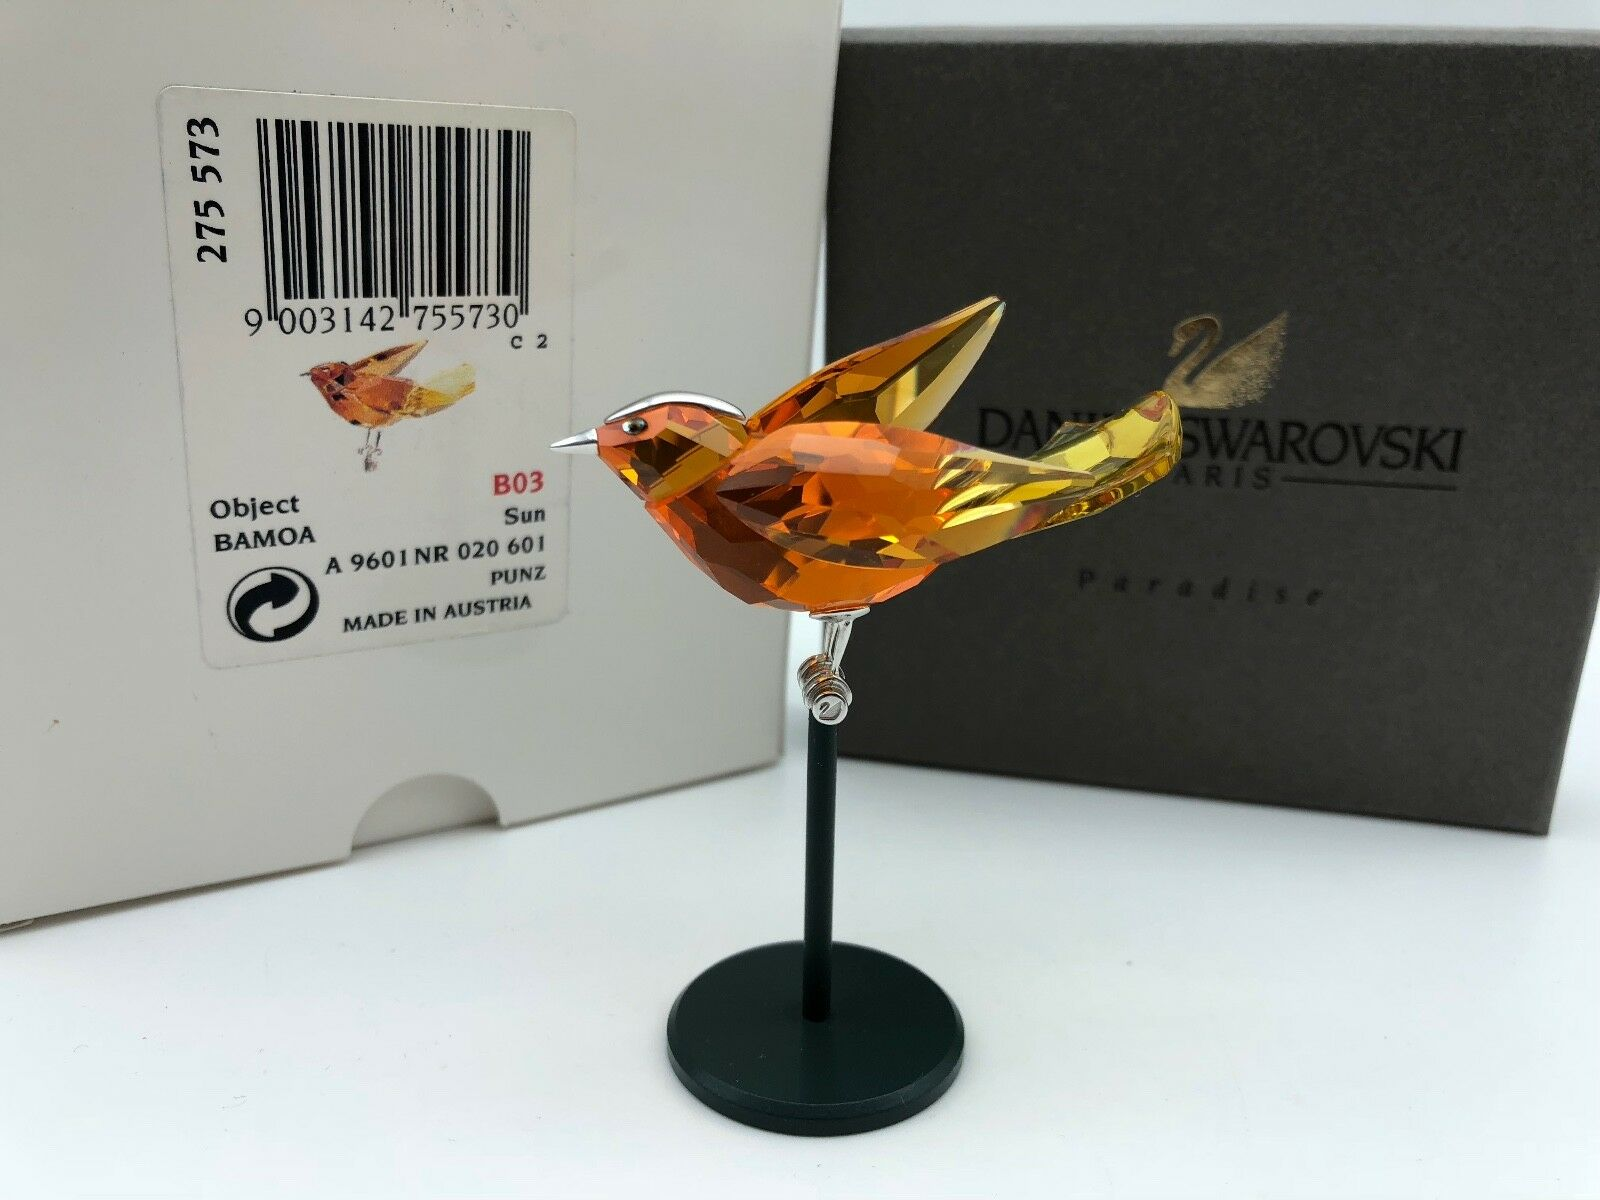 Swarovski Figur 275573 Vogel Bamoa Sun 7,9 cm. Mit Ovp & Zertifikat. Top Zustand